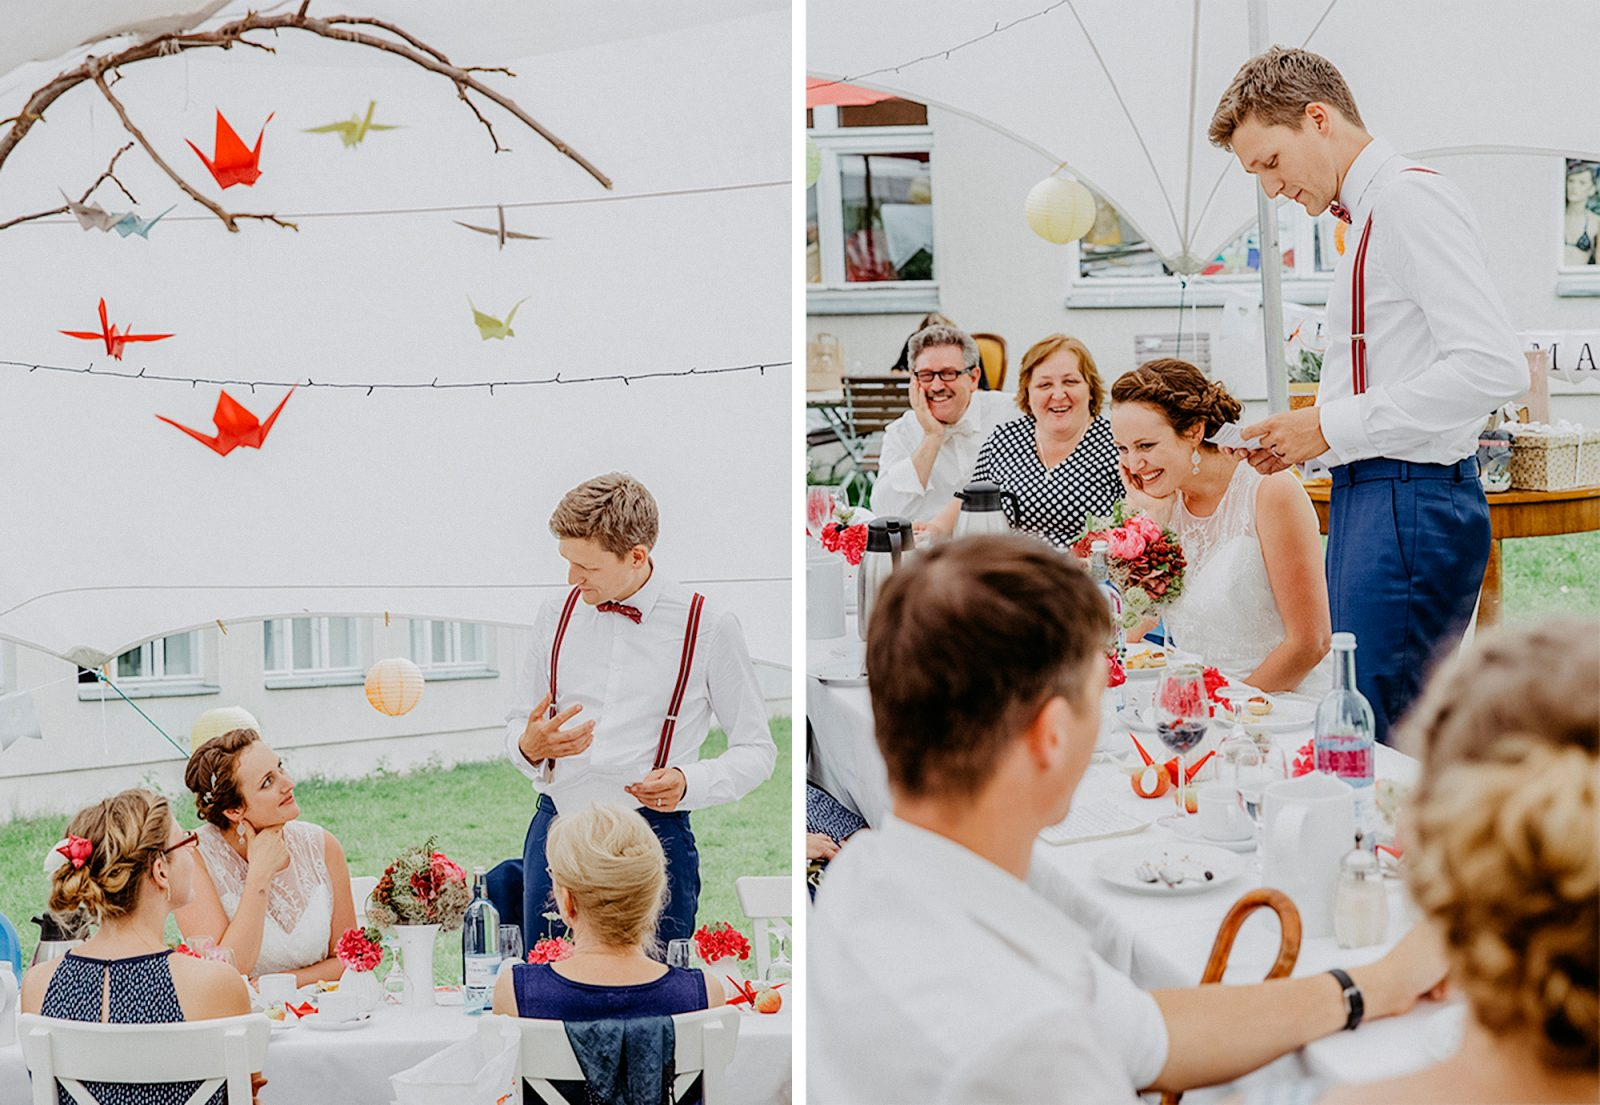 Hochzeit_Potsdam_fotograf_G34_1